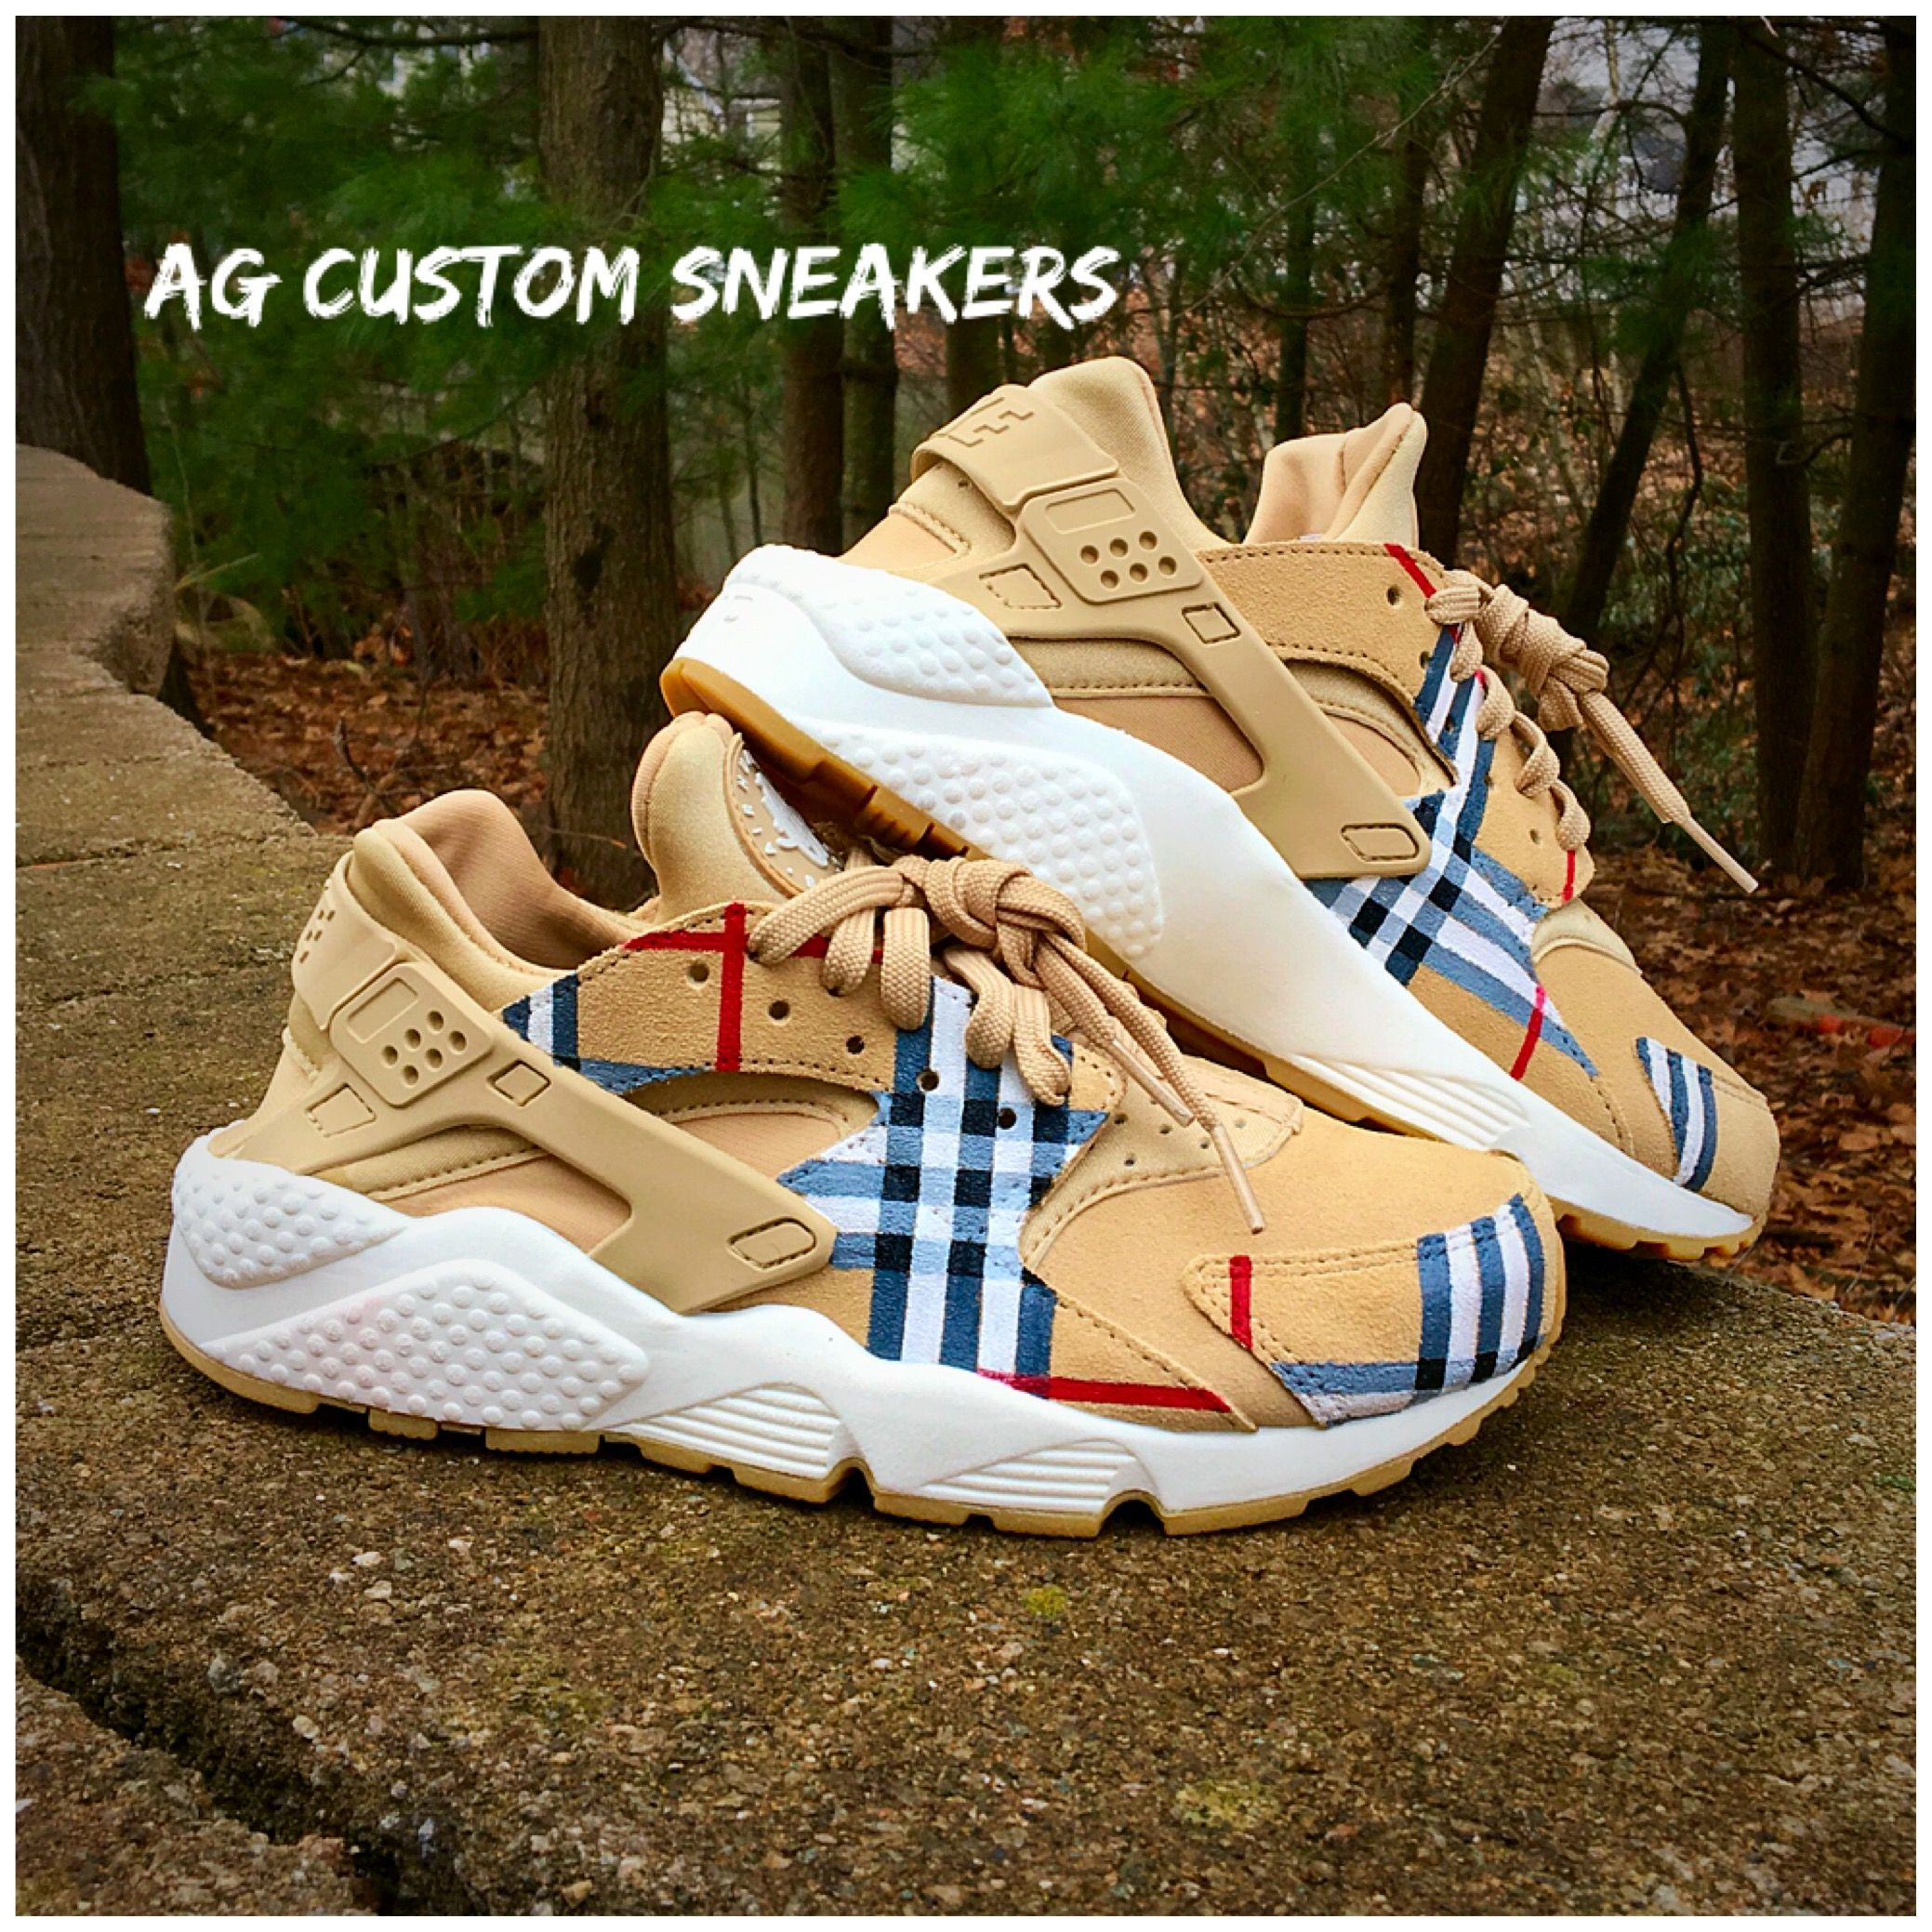 1089766b32 Nike Huarache · Huaraches · Summer Shoes · Burberry Custom Sneakers by AG Custom  Sneakers https   www.etsy.com